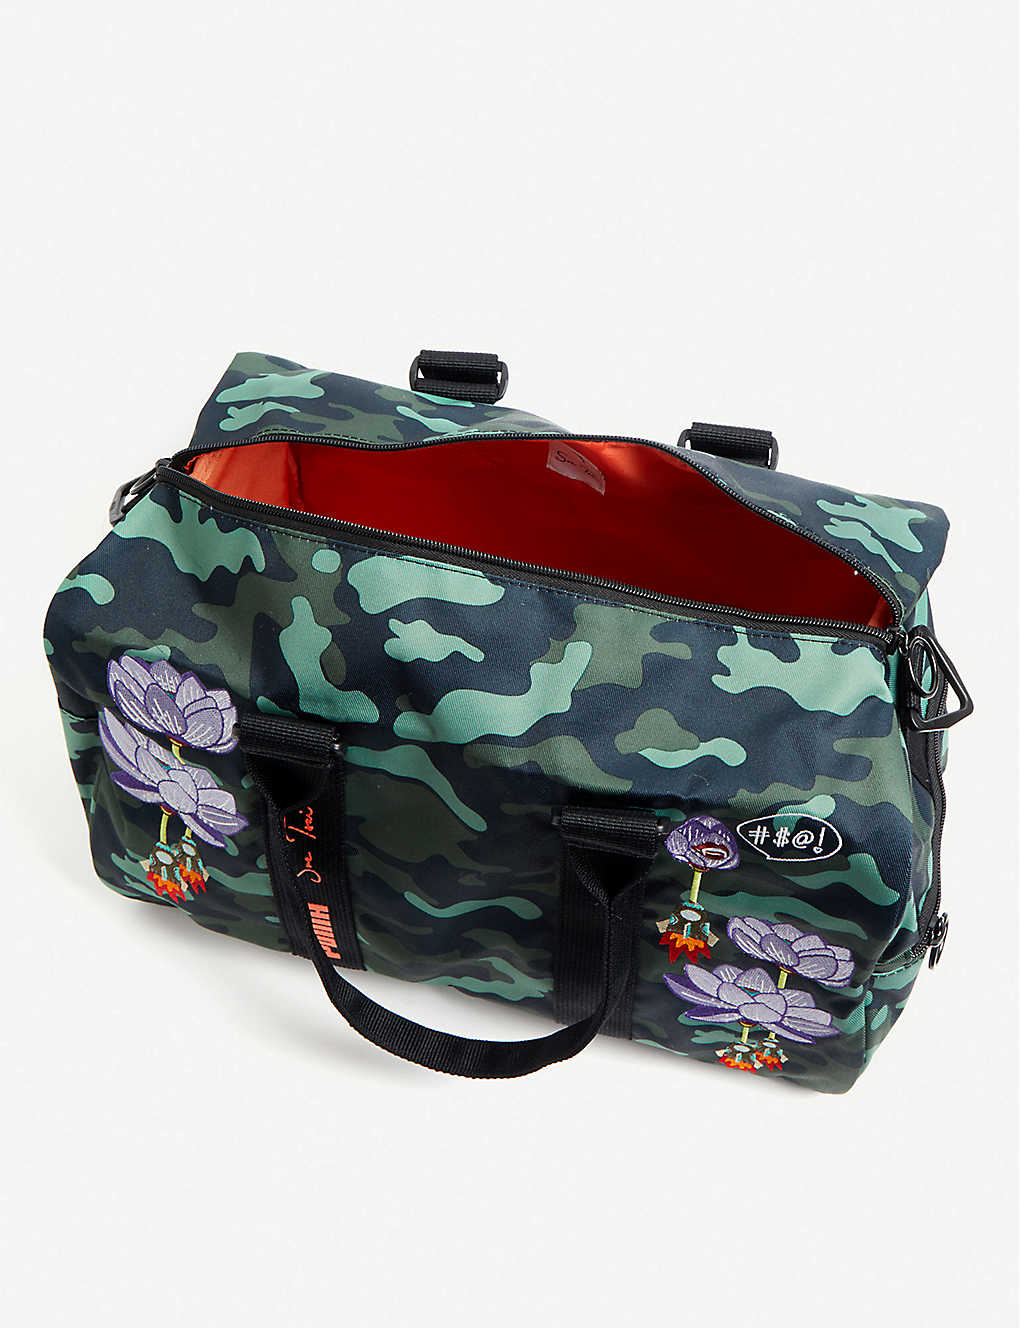 93f3e6b7560 ... PUMA x Sue Tsai floral-embroidered holdall - Puma black aop zoom